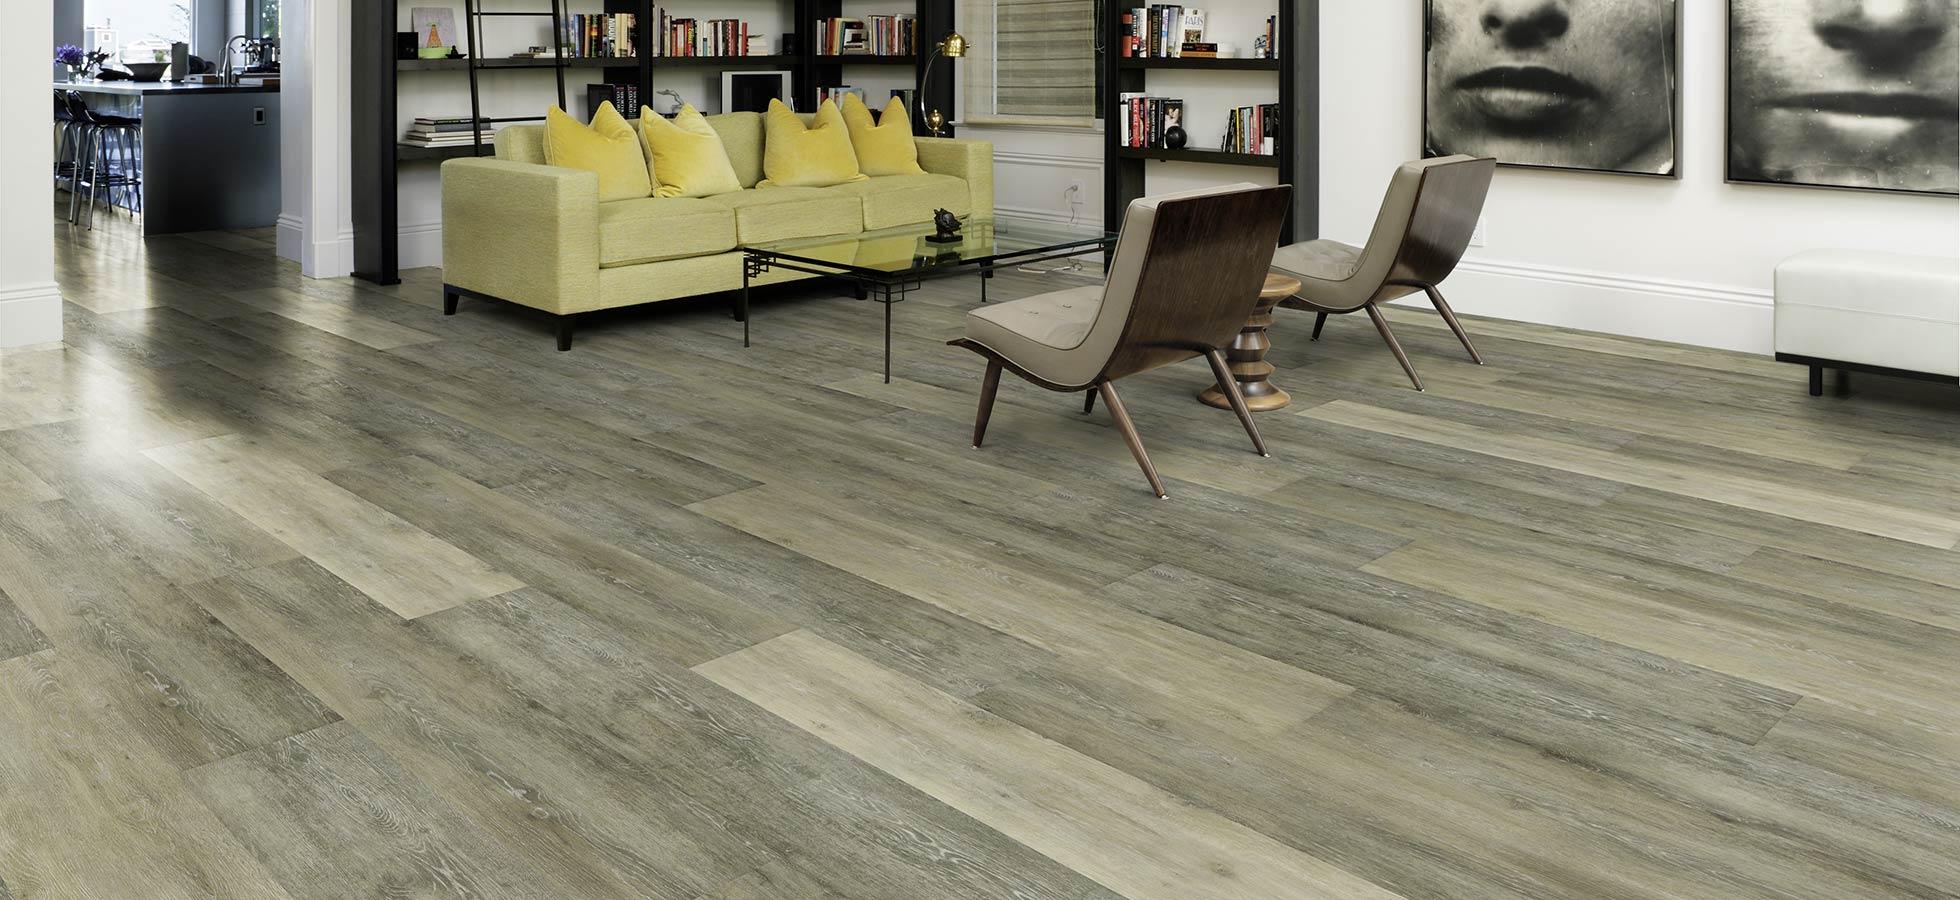 Modin Vinyl Plank Flooring Shapeyourminds Com